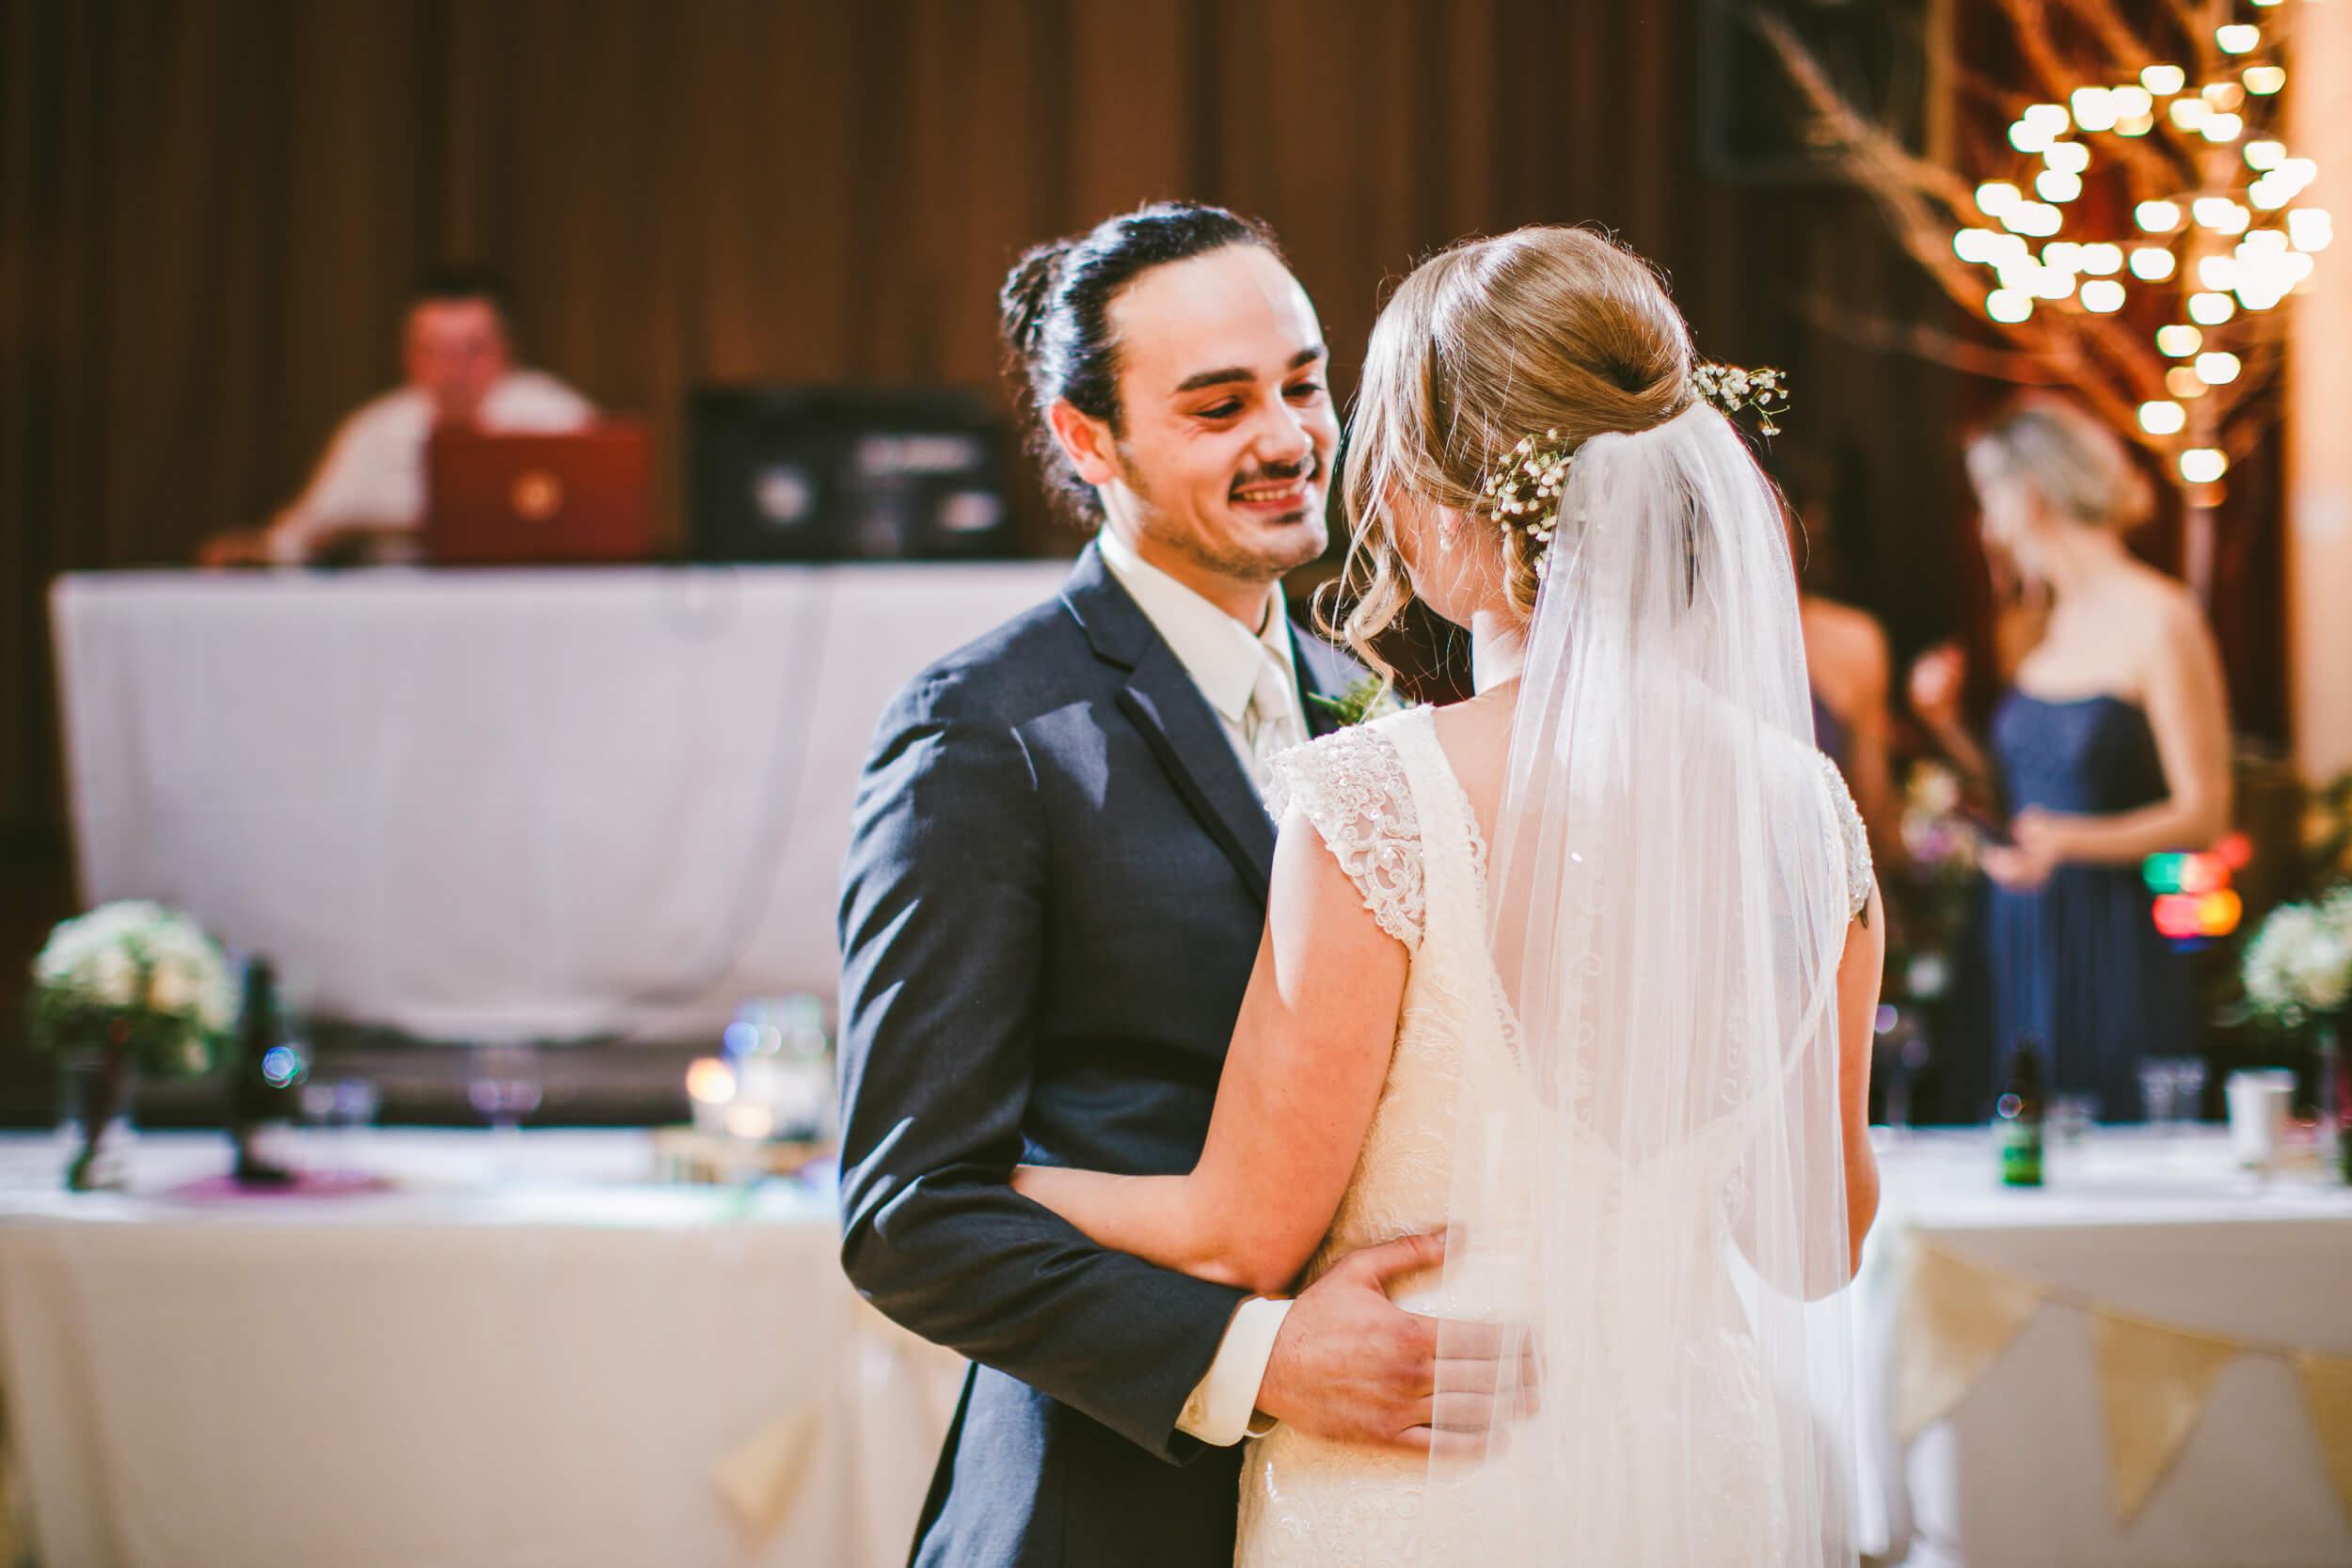 mukogawa winter wedding in spokane (273).jpg